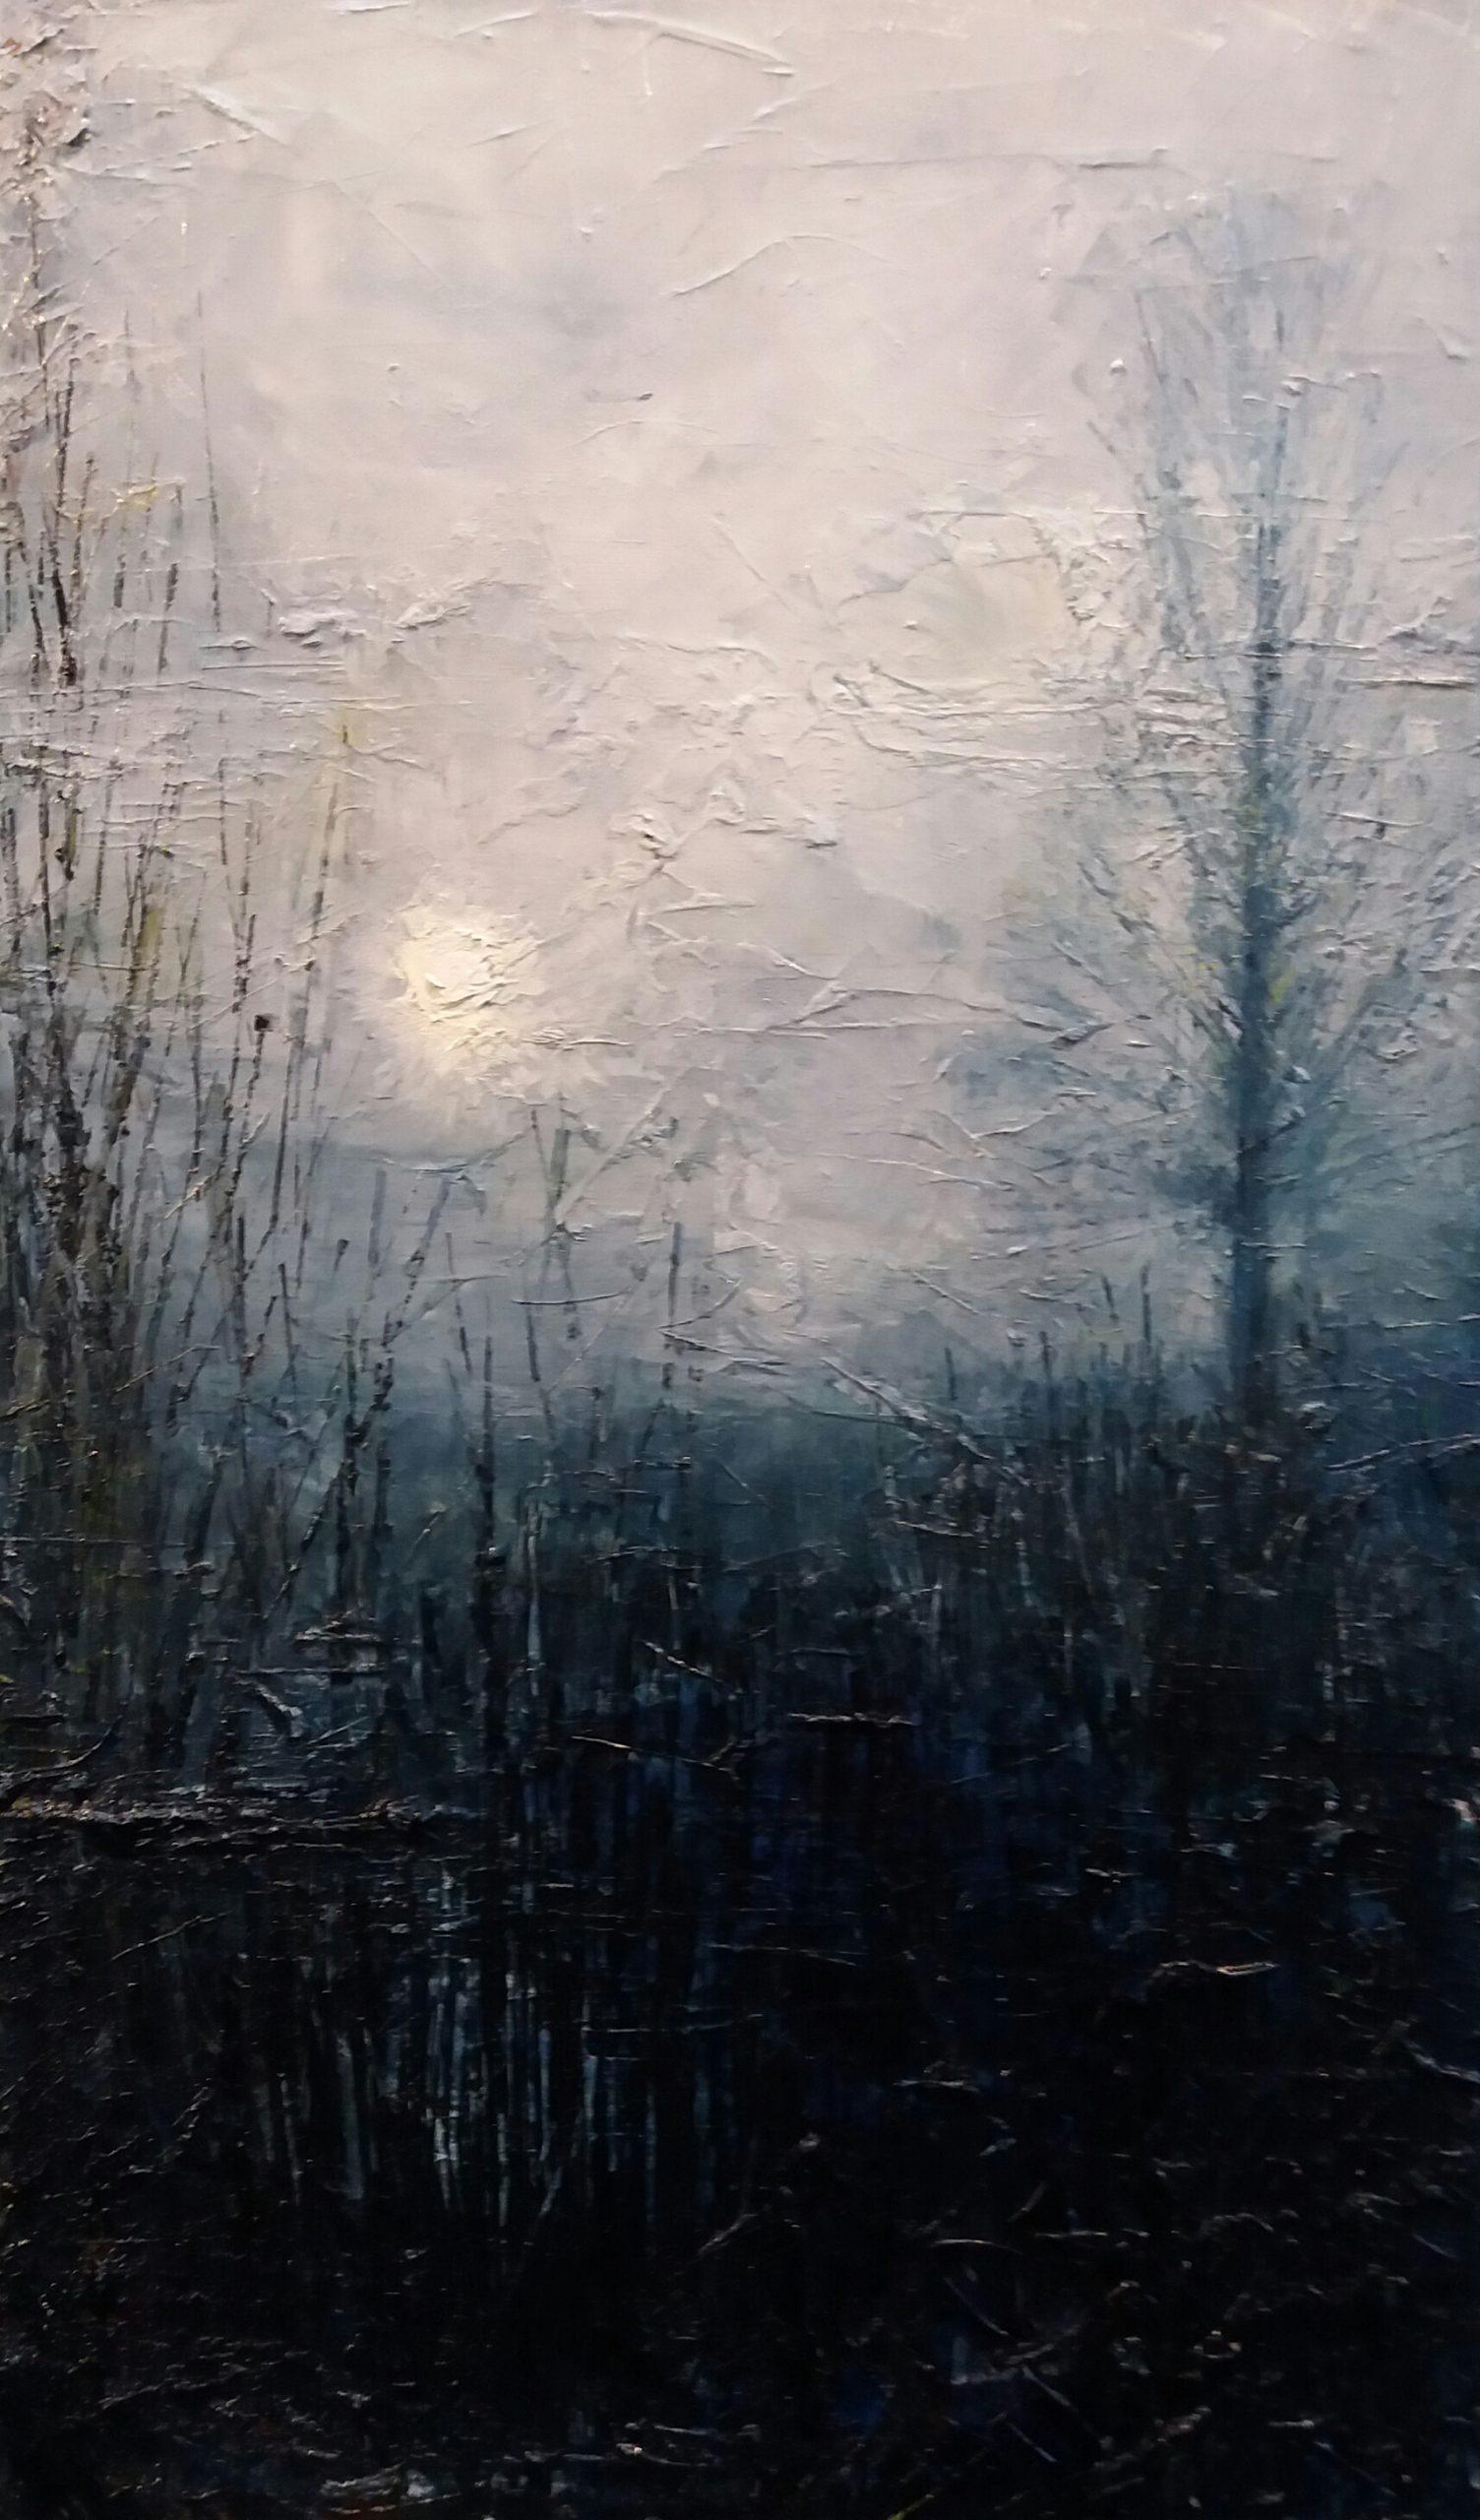 Morning Fog, Geldeston. Oil on Canvas. oil landscape painting, Norfolk.